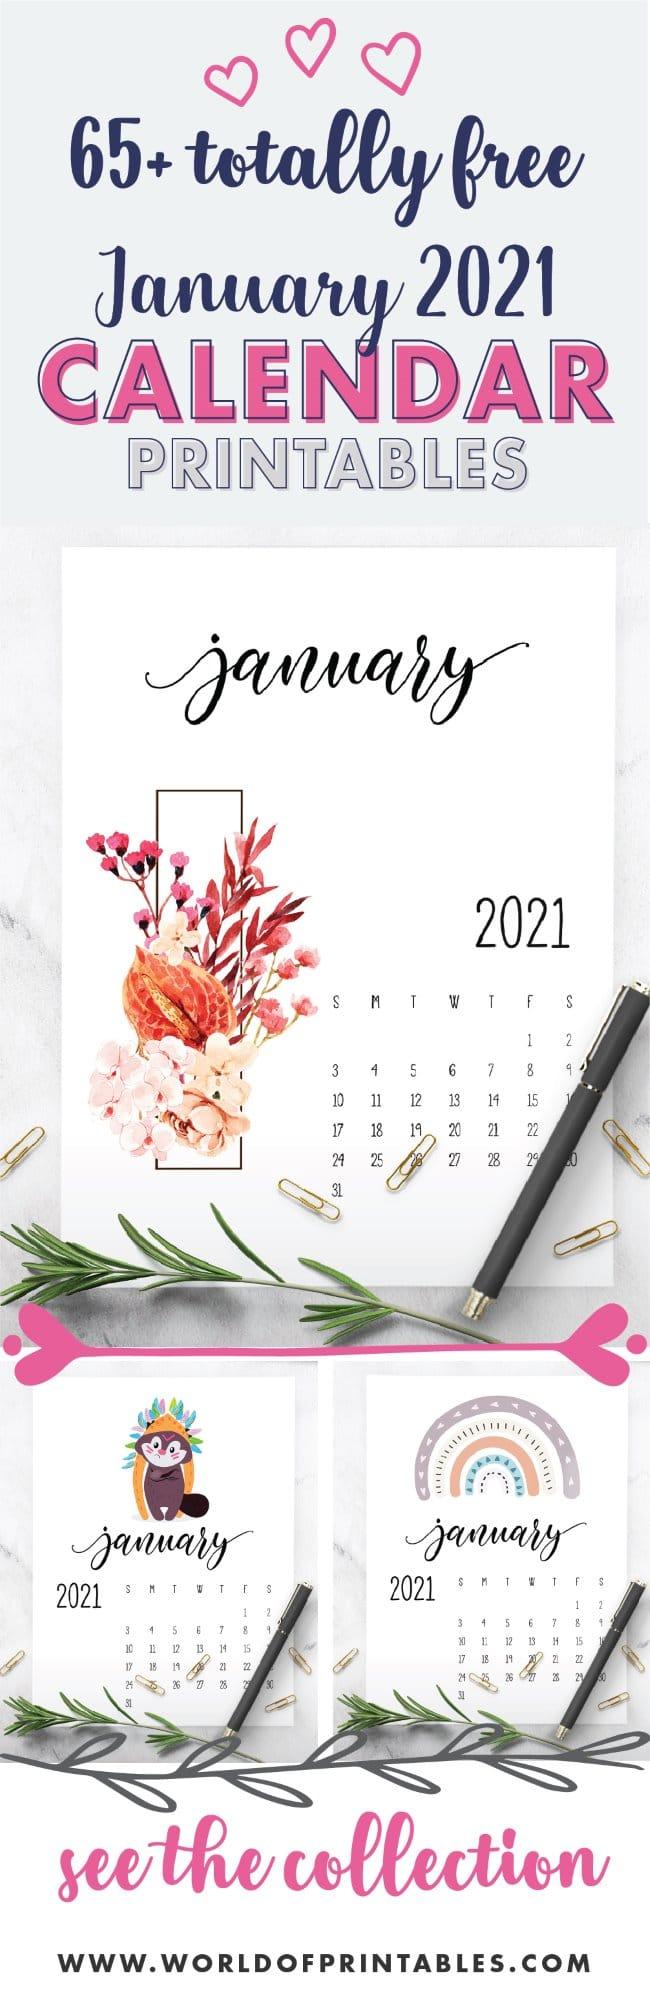 65 free January 2021 Calendar Printables